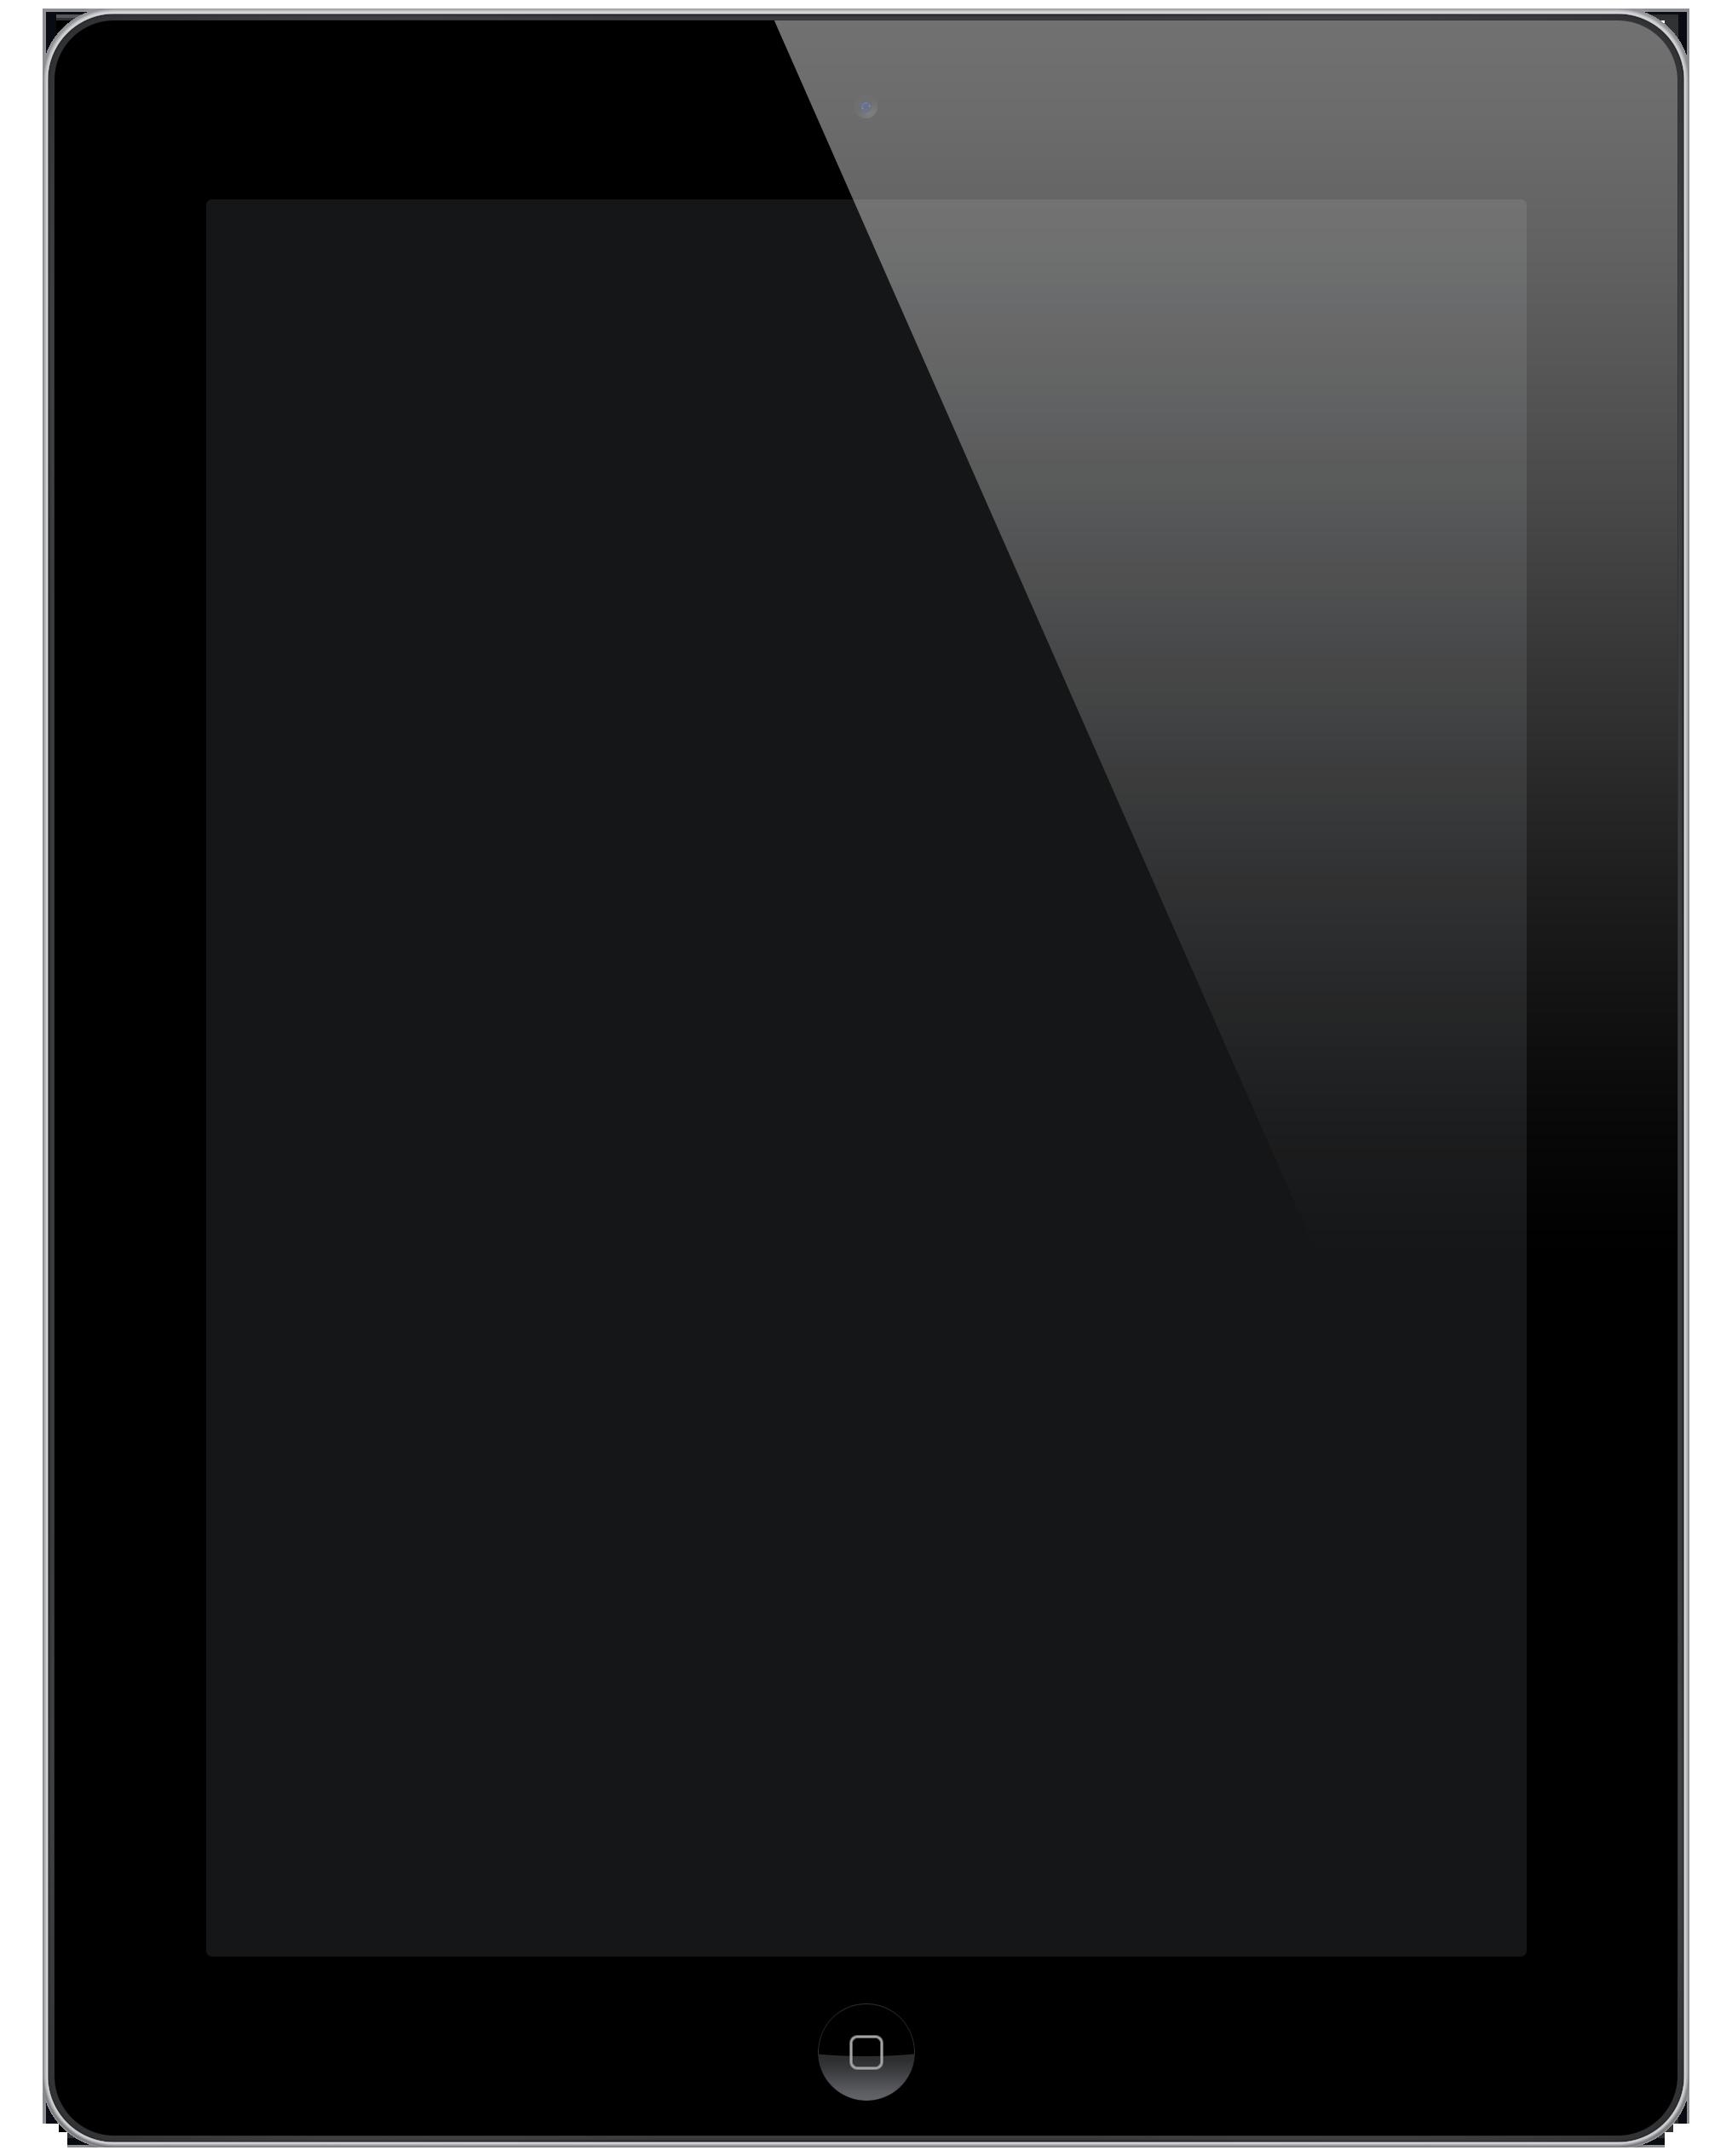 Original file PlusPng.com  - Ipad PNG